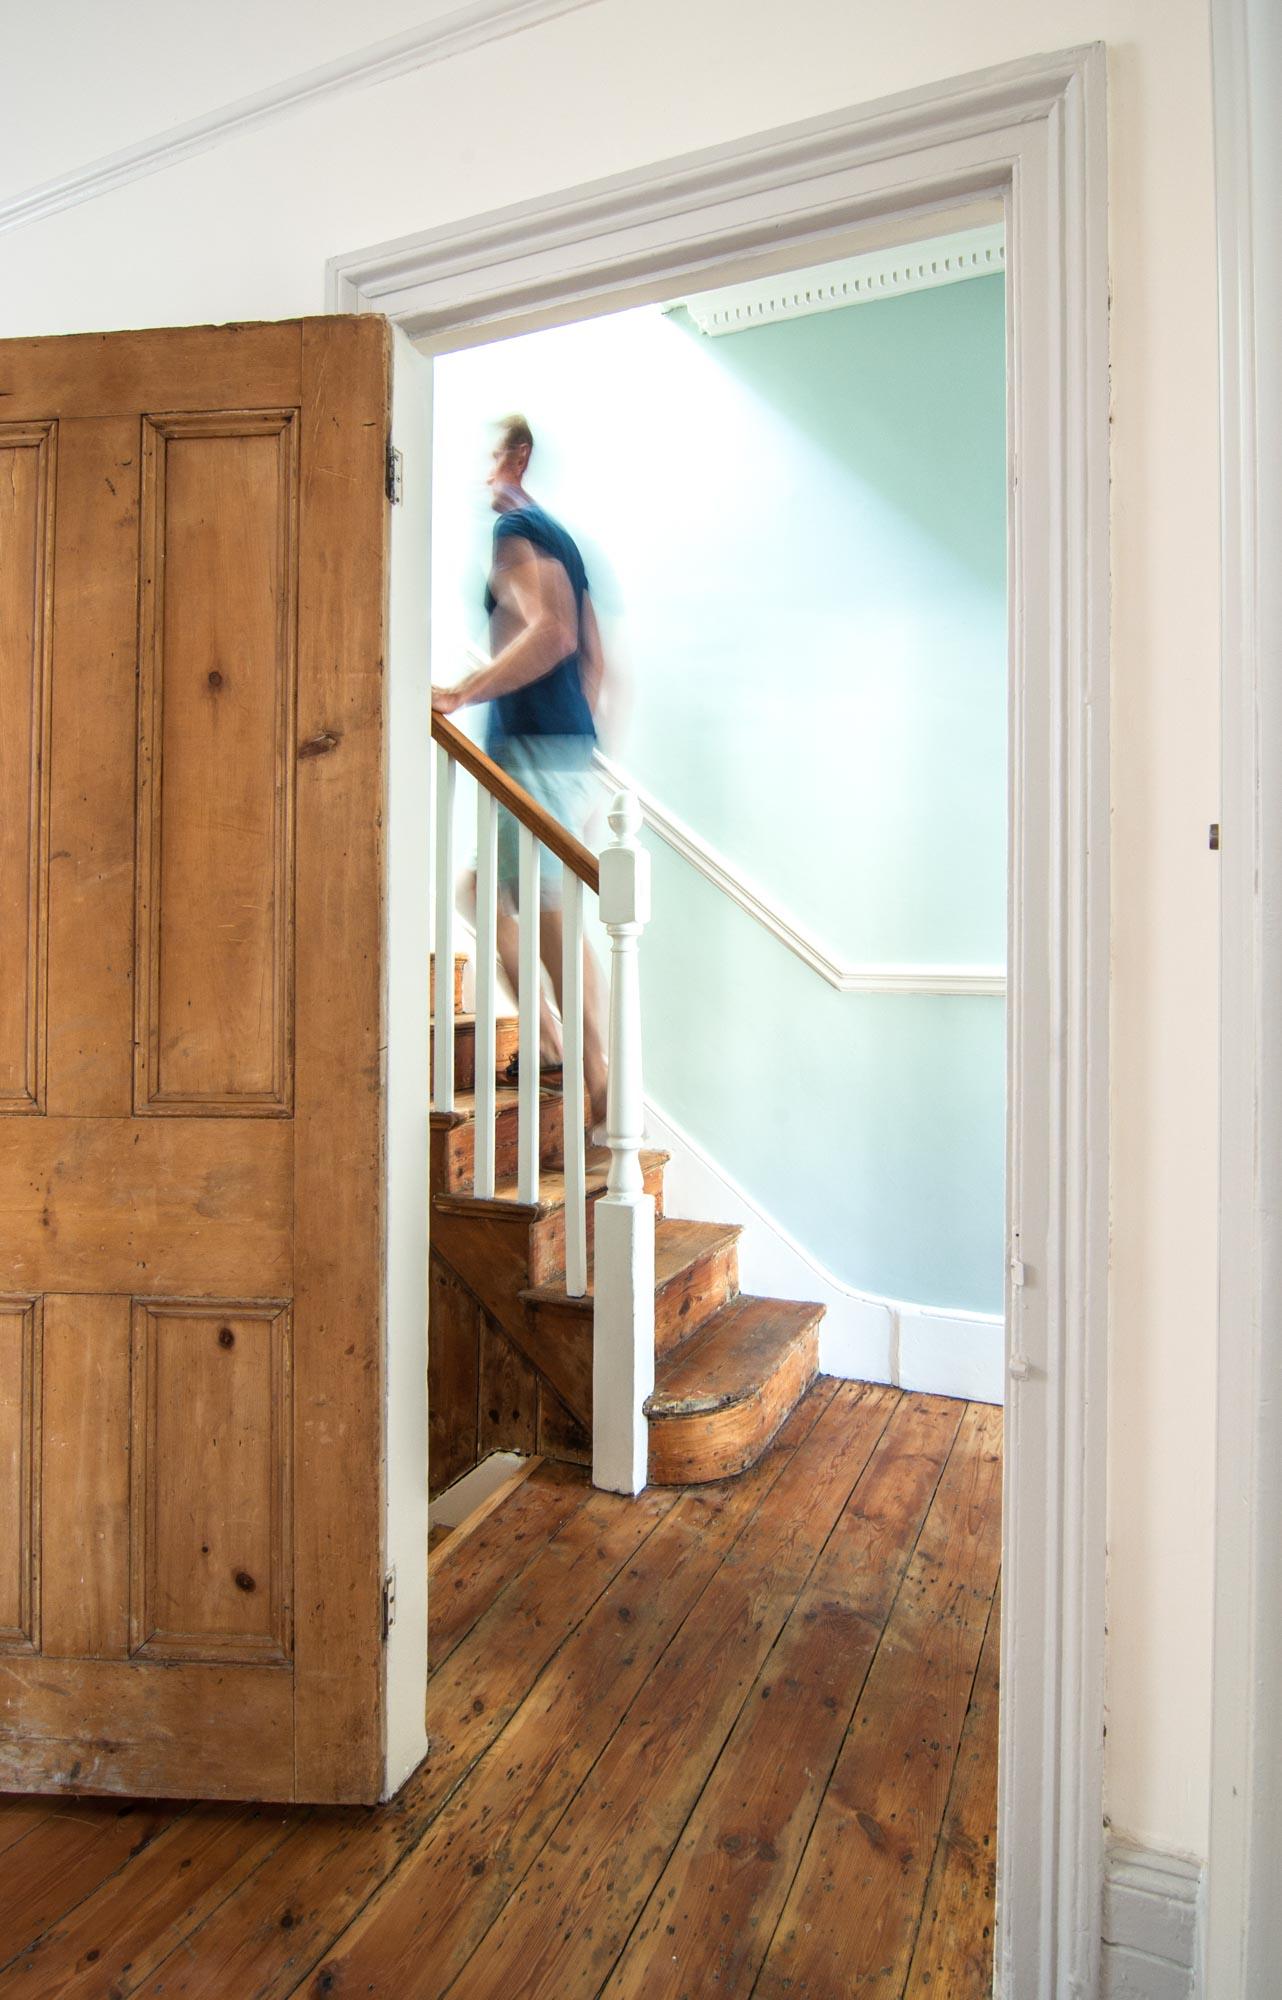 Rustic floors and door in a Victorian terraced house in Stoke Newington.